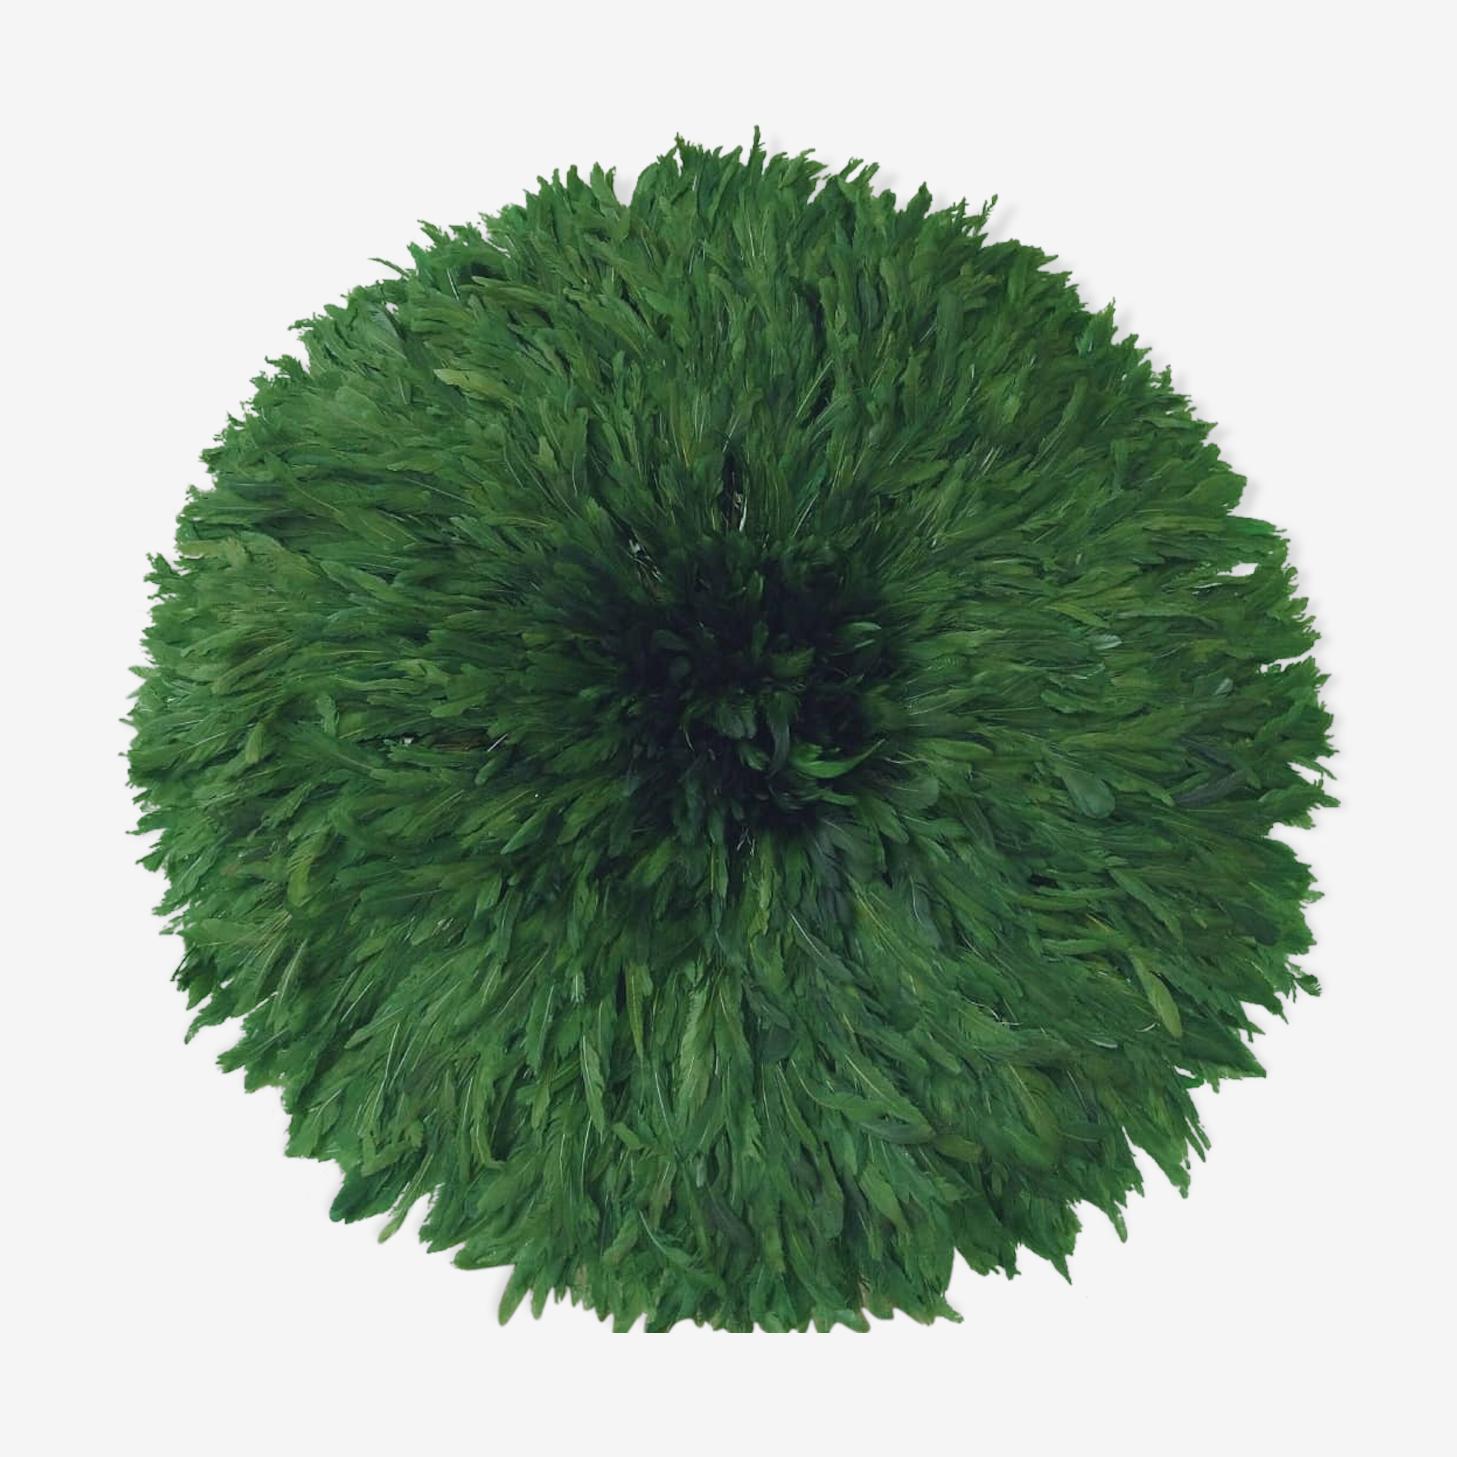 Juju military green hat of 80 cm